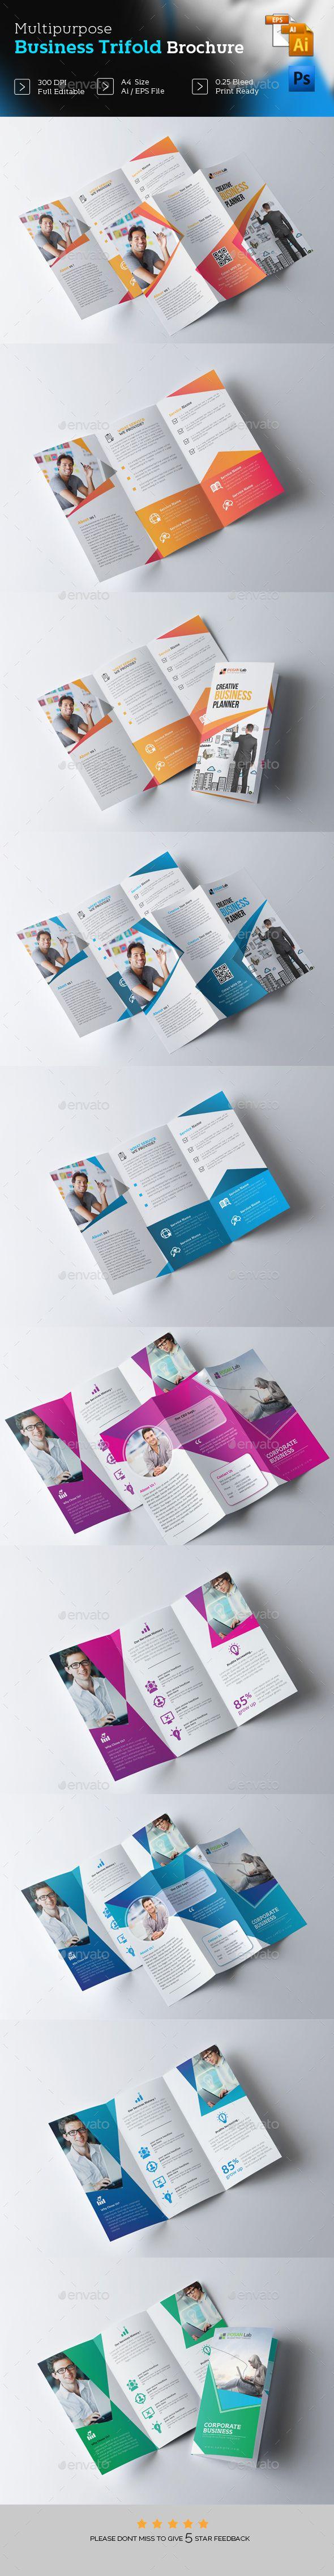 2 Trifold Brochure Design Templates PSD Vector EPS InDesign INDD AI Illustrator